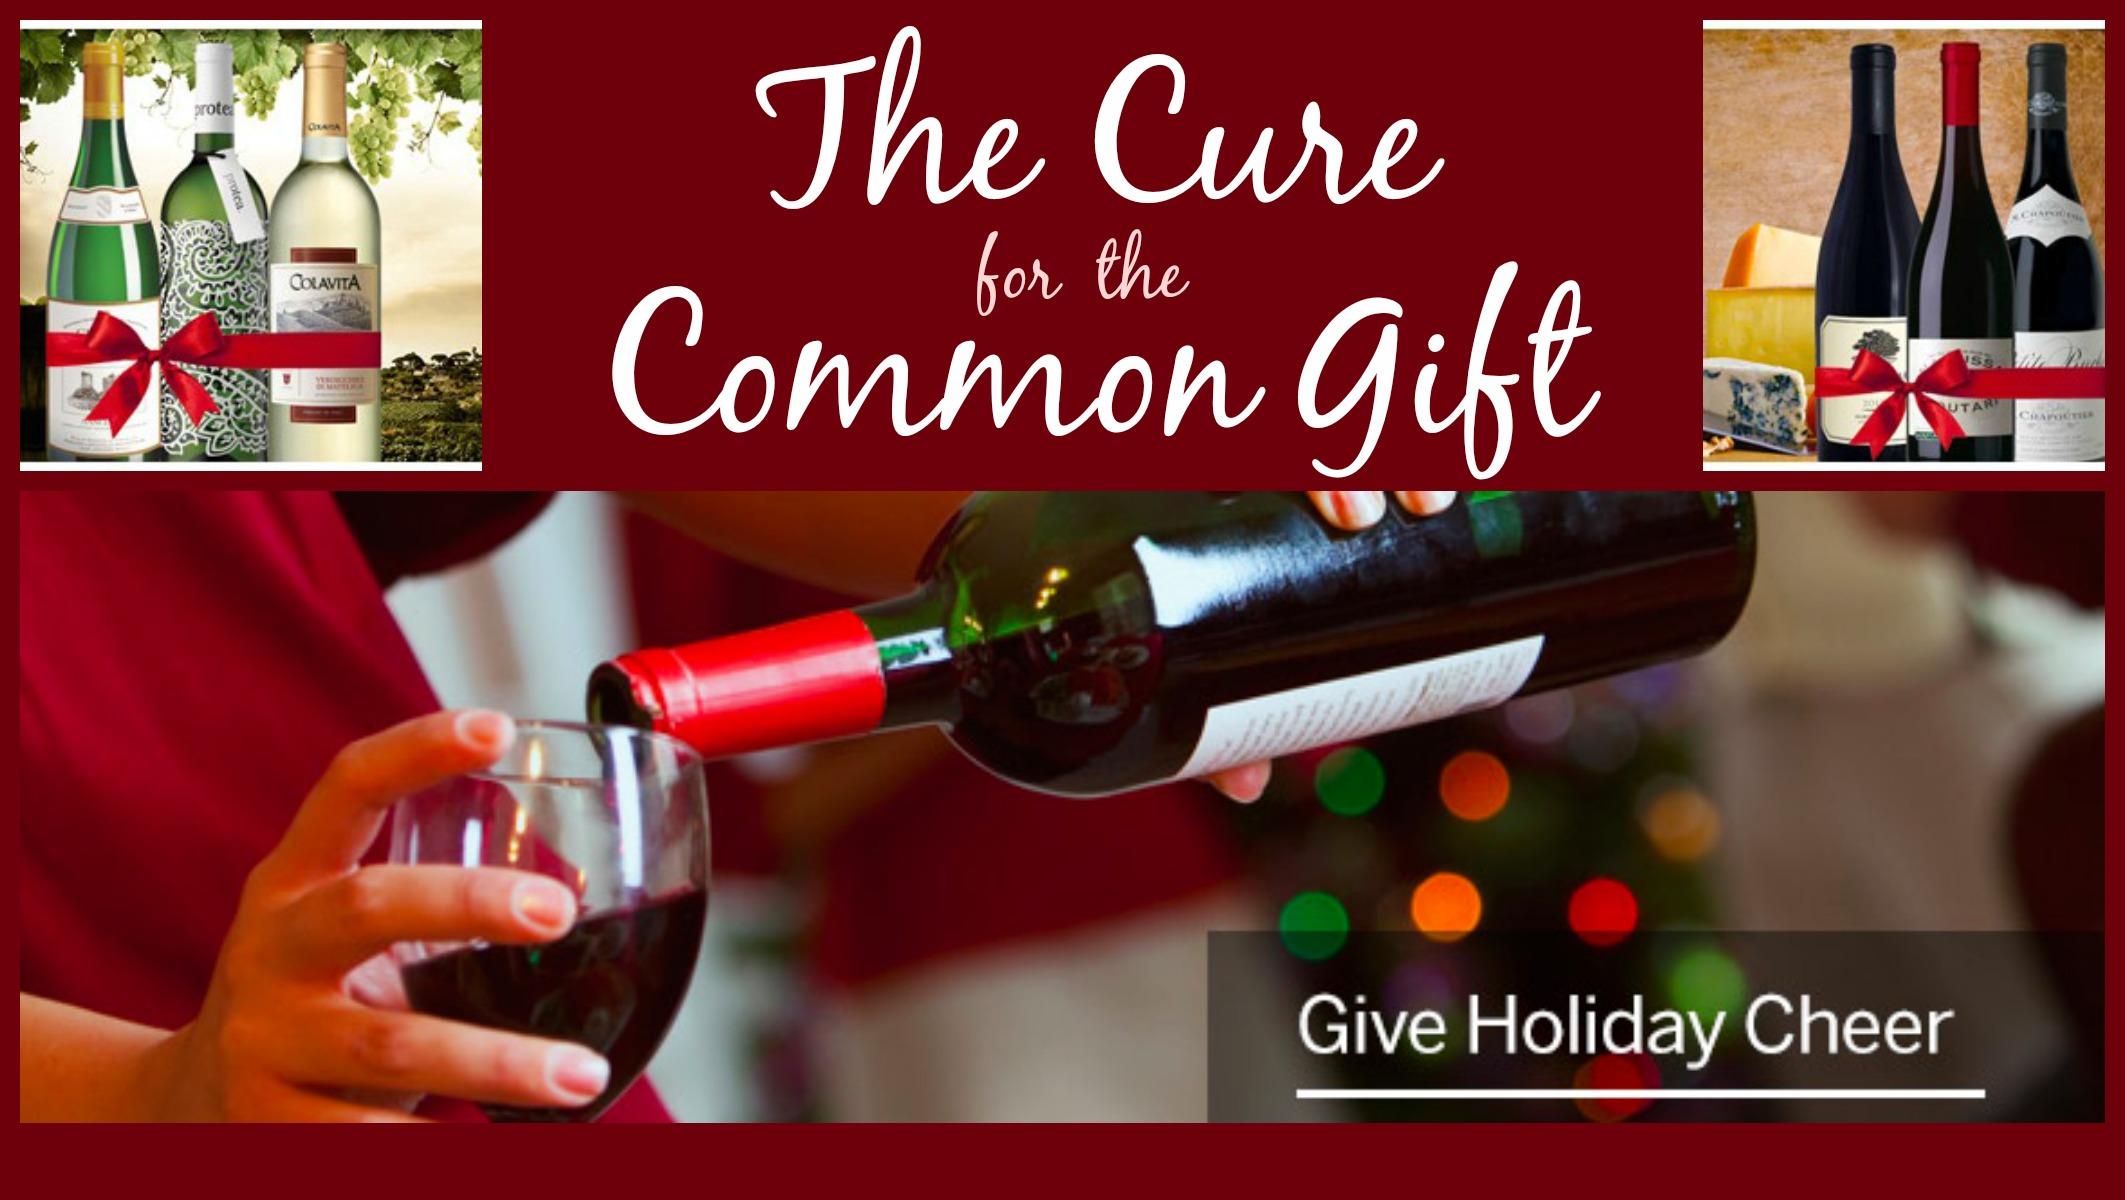 Cure for the Common Gif California Wine Club, Wine Club Subscription